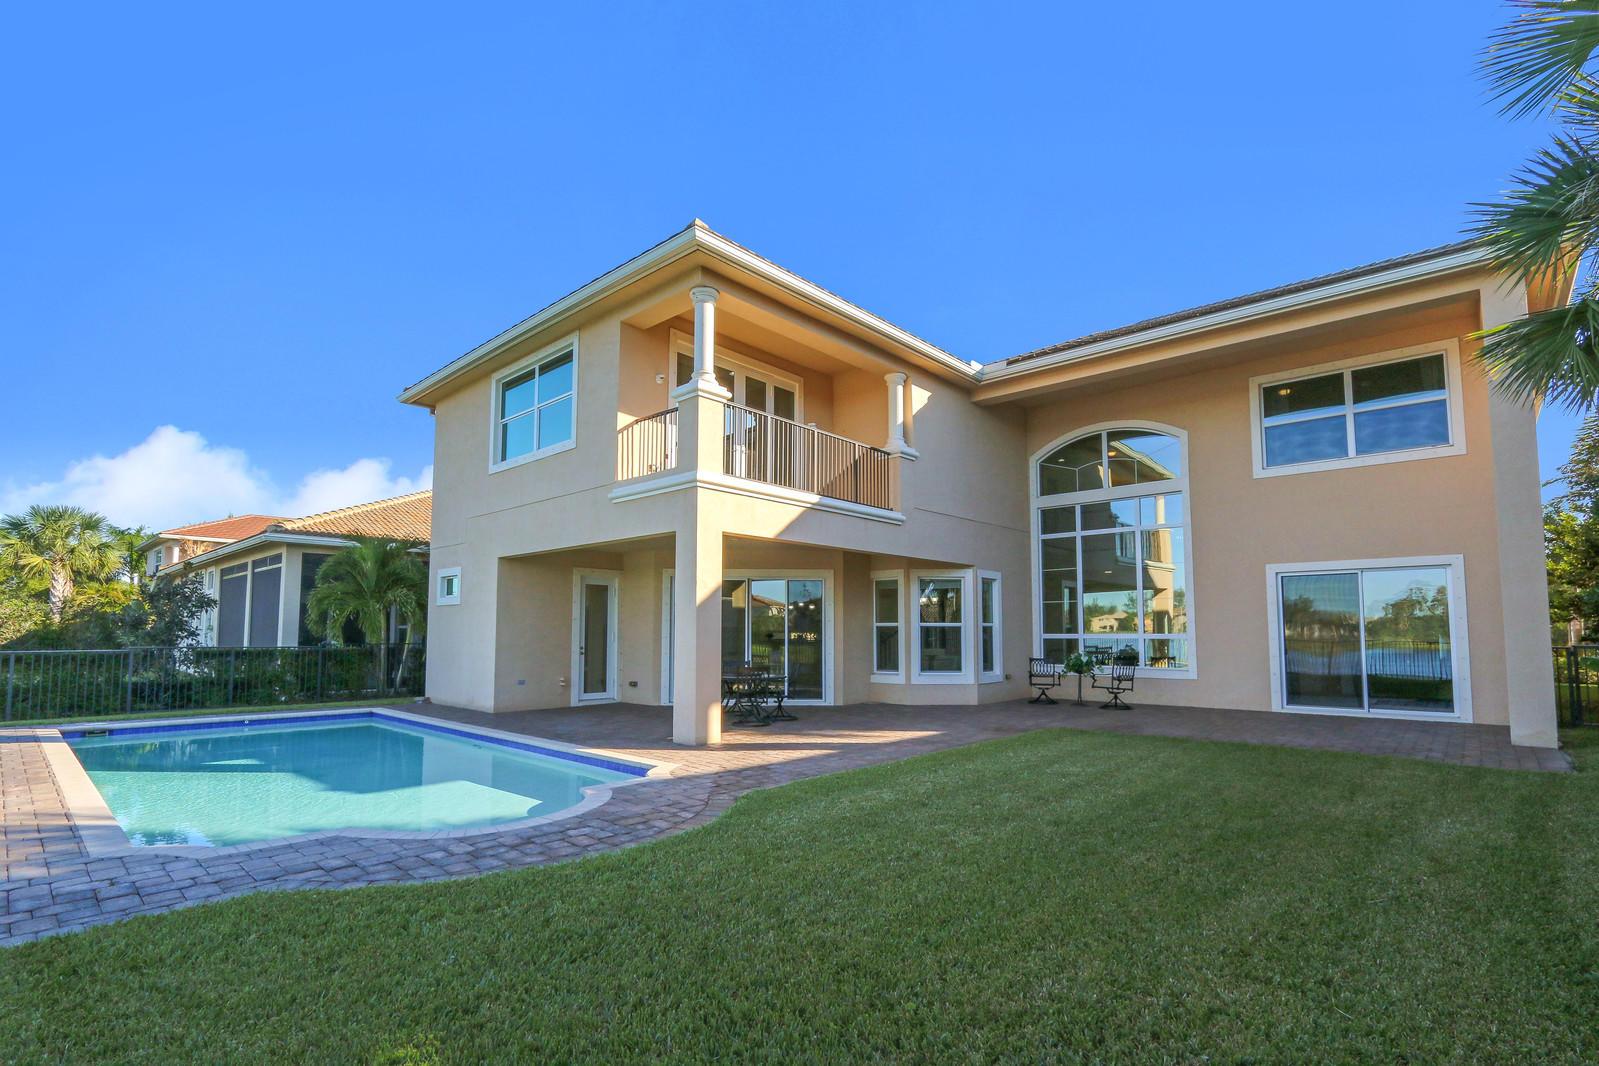 WELLINGTON VIEW WEST PALM BEACH FLORIDA